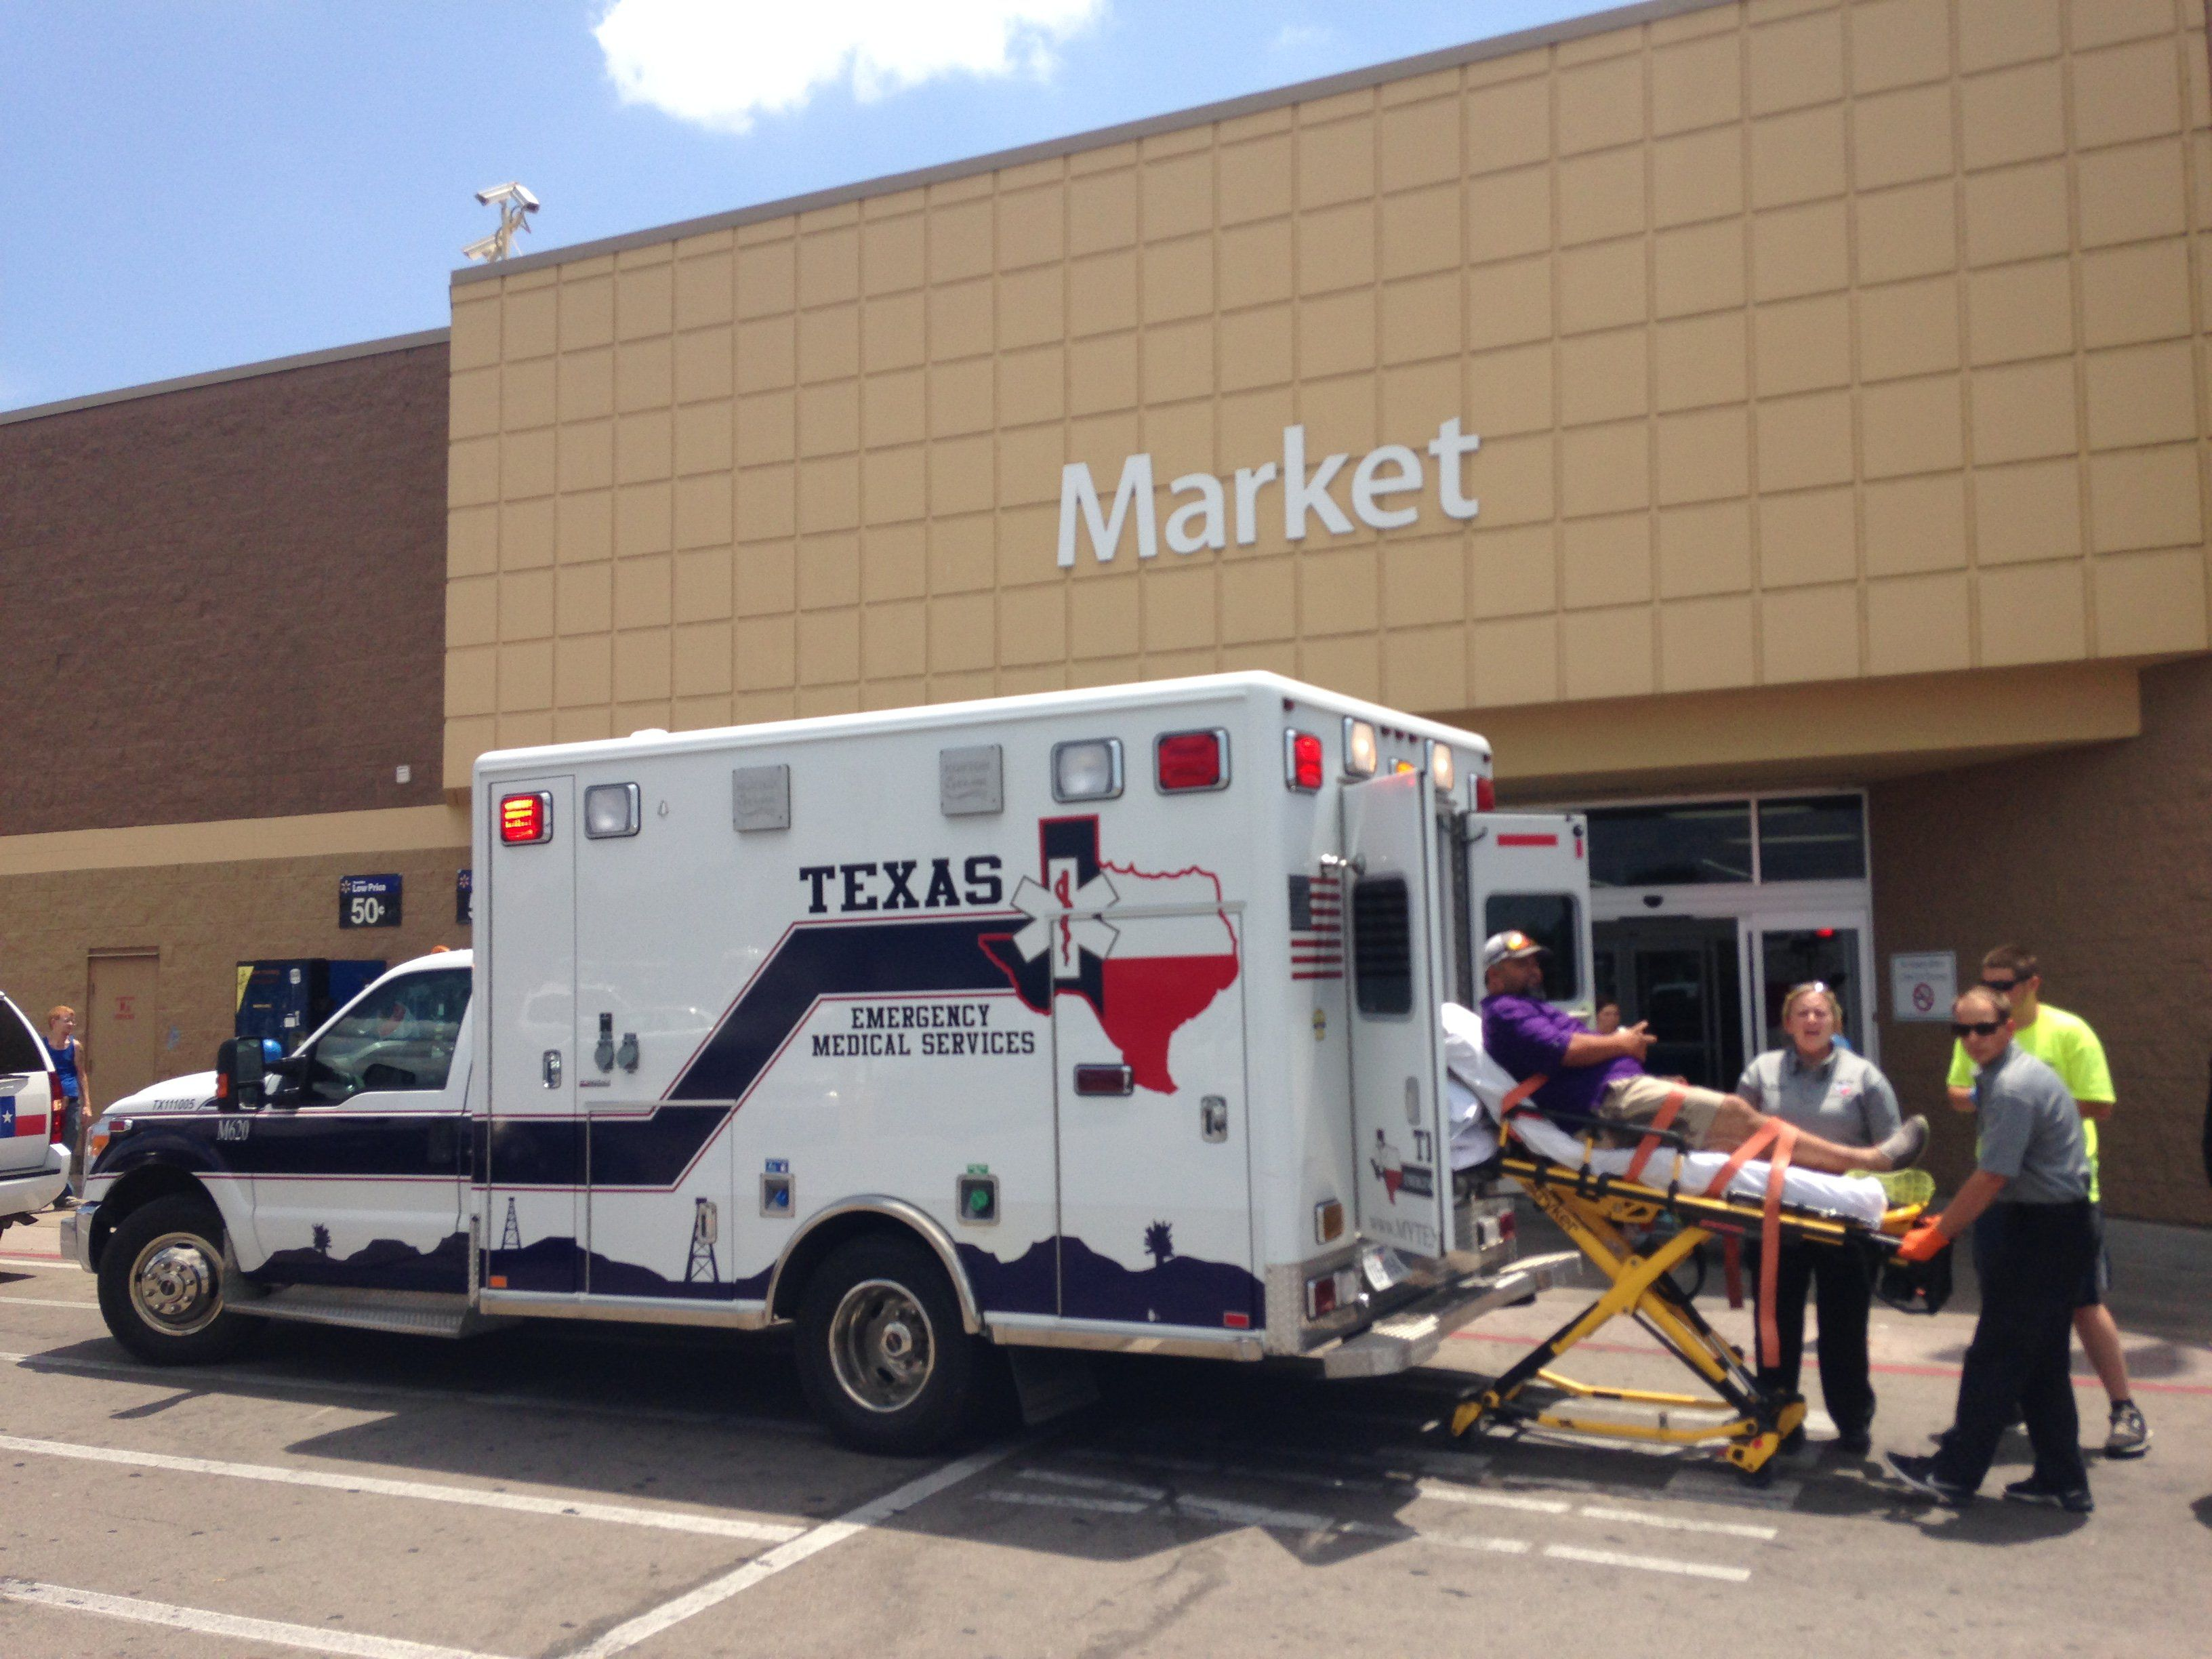 Pin On Accidentally Shot At Walmart